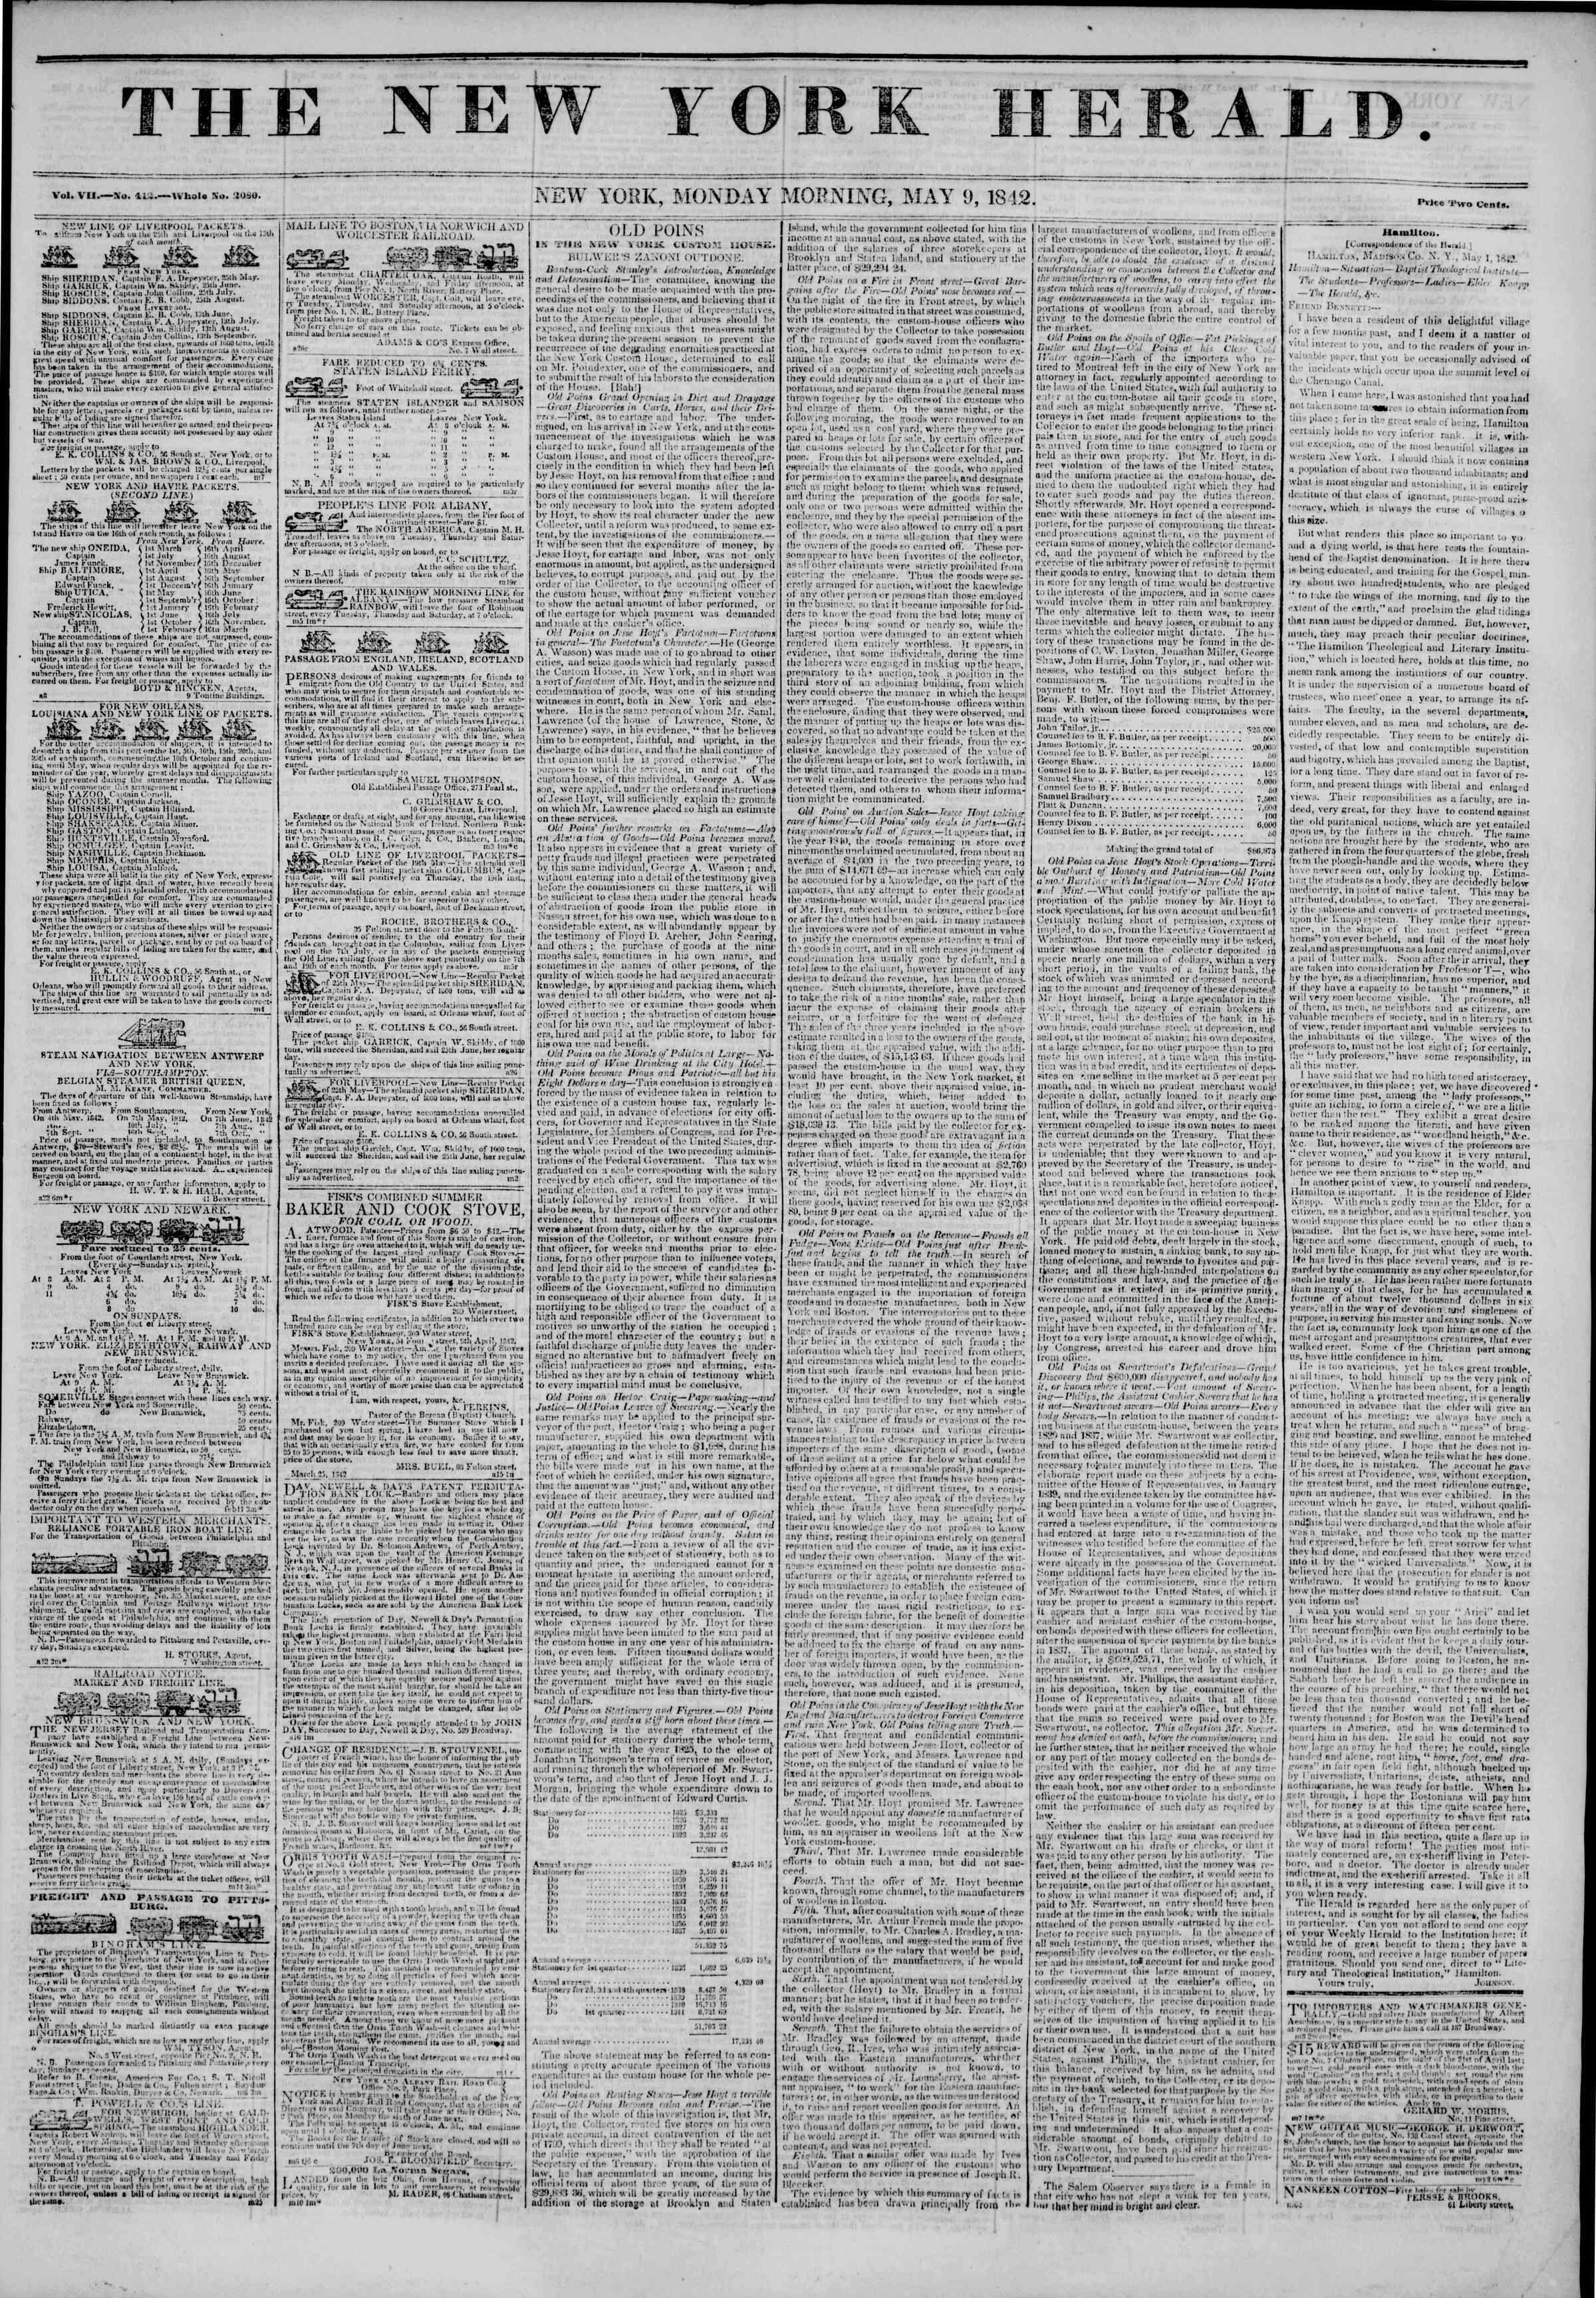 May 9, 1842 Tarihli The New York Herald Gazetesi Sayfa 1